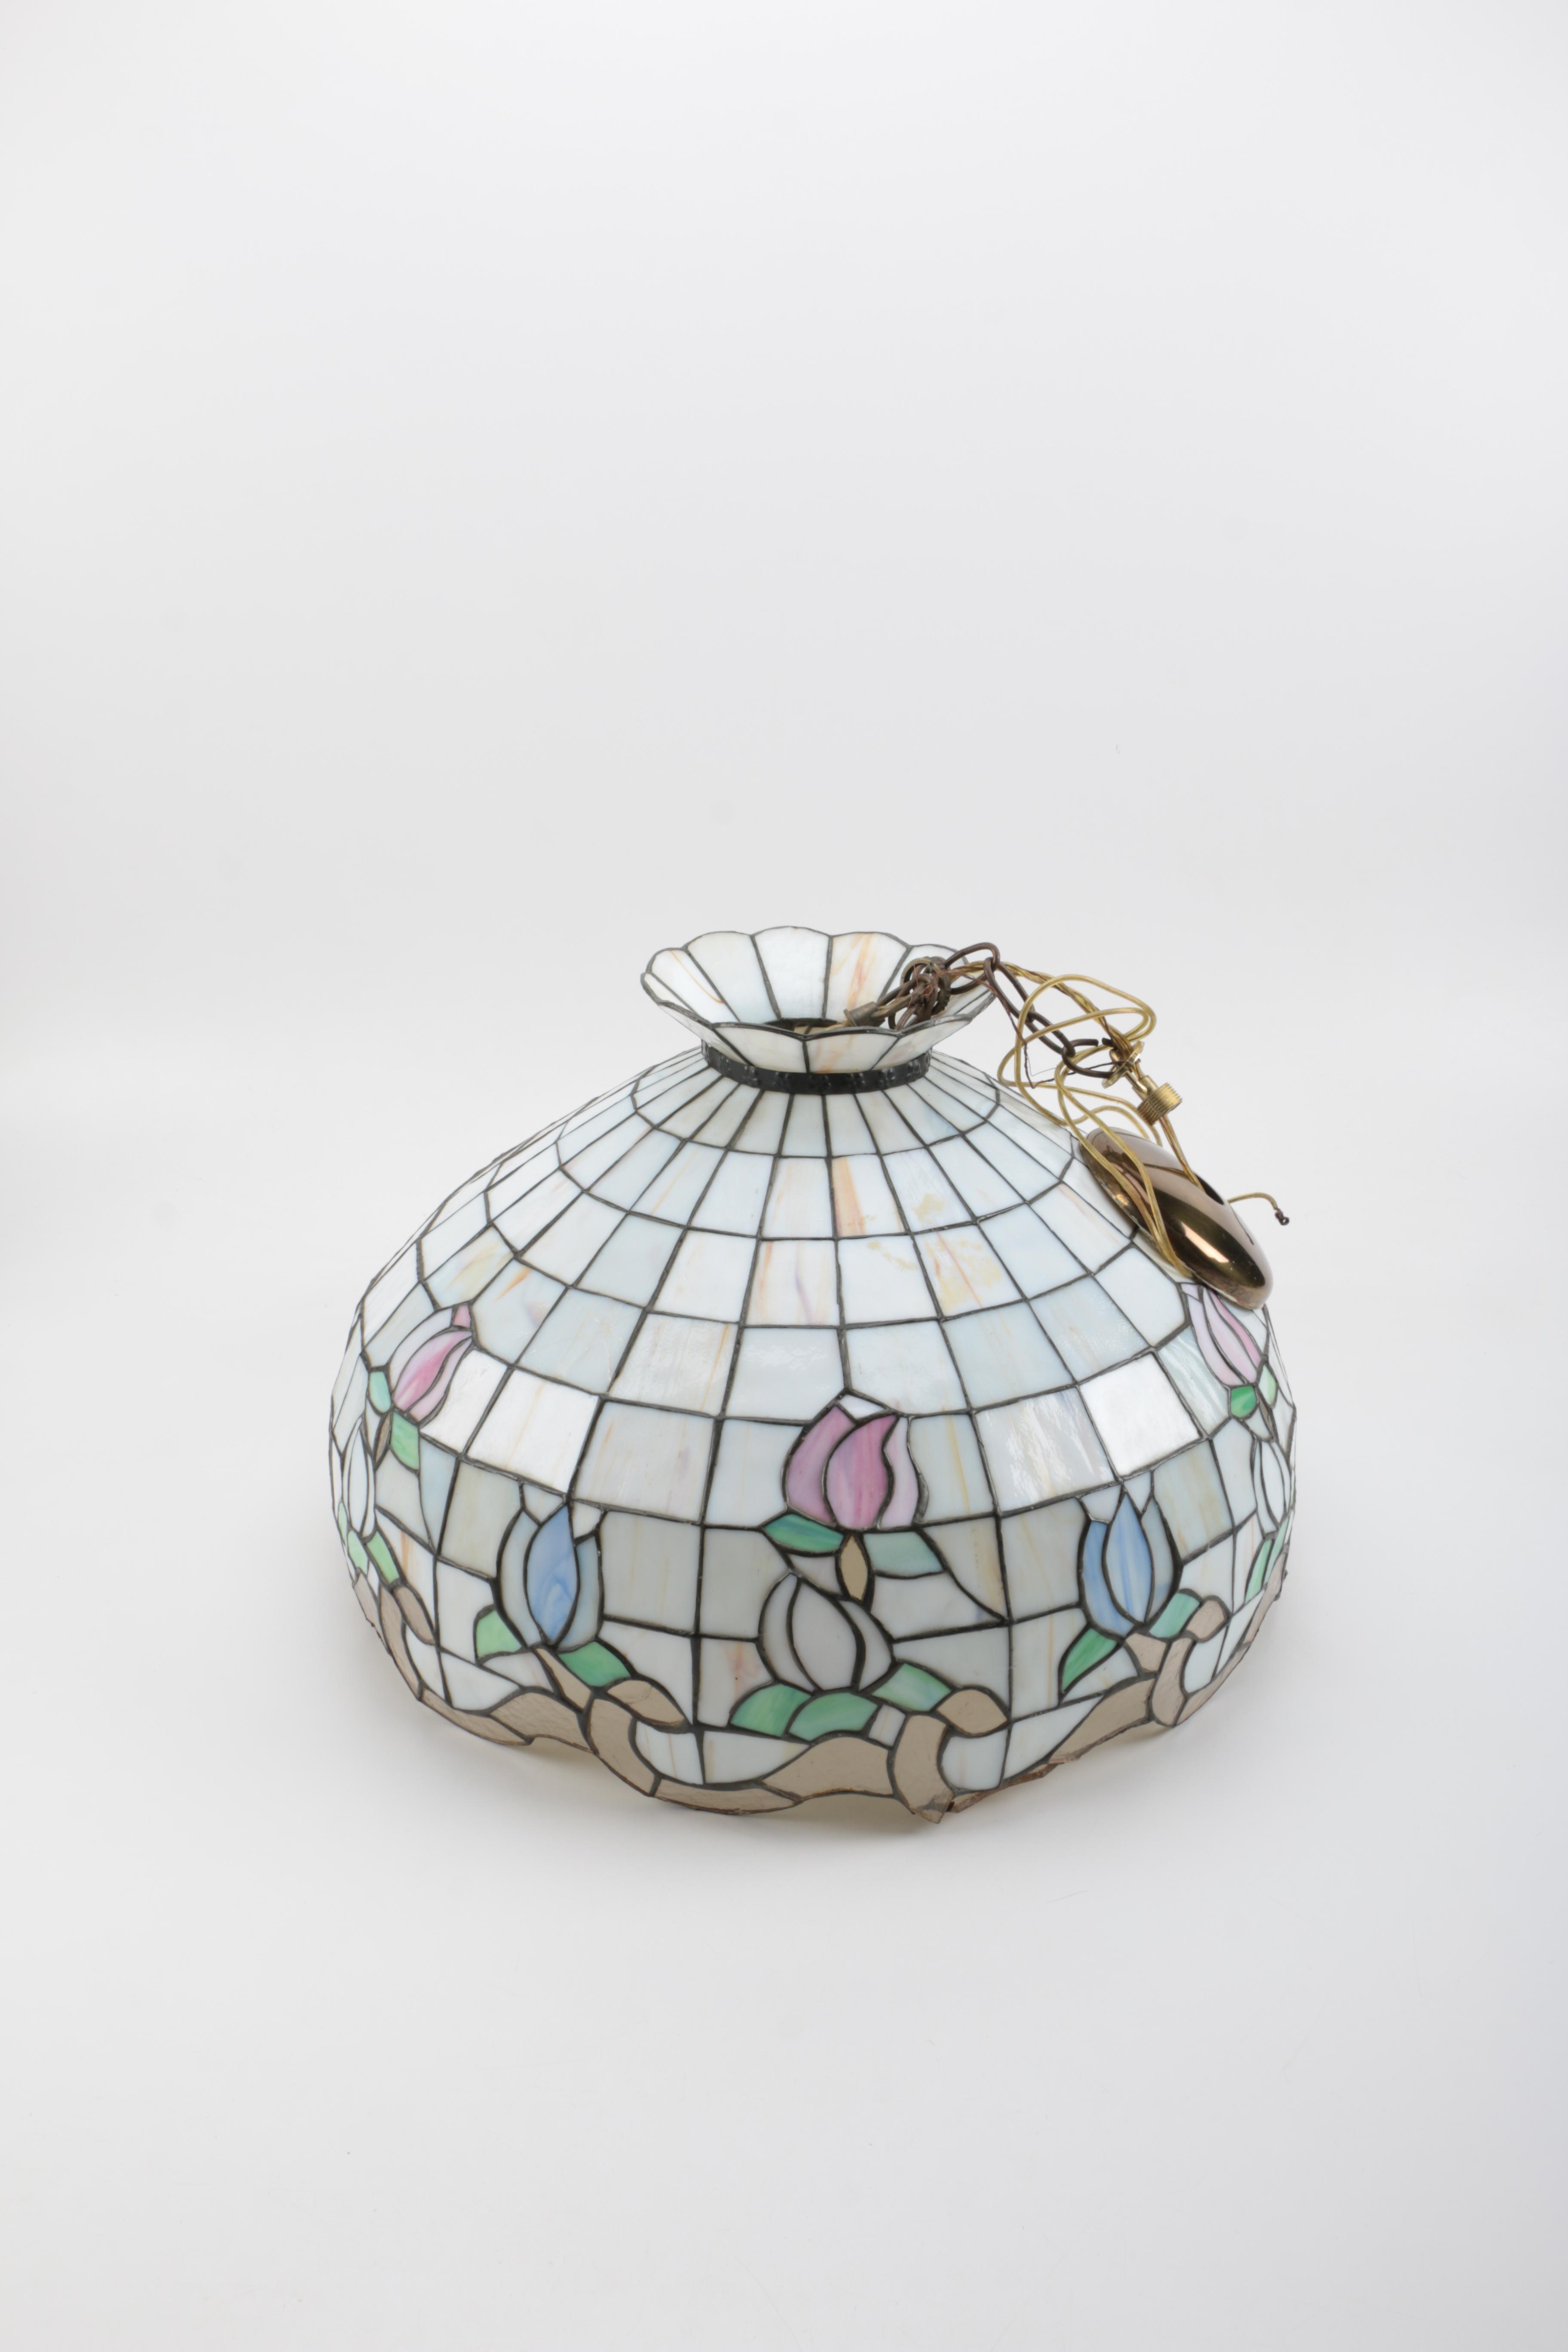 Tiffany-Style Slag Glass Pendant Light Fixture